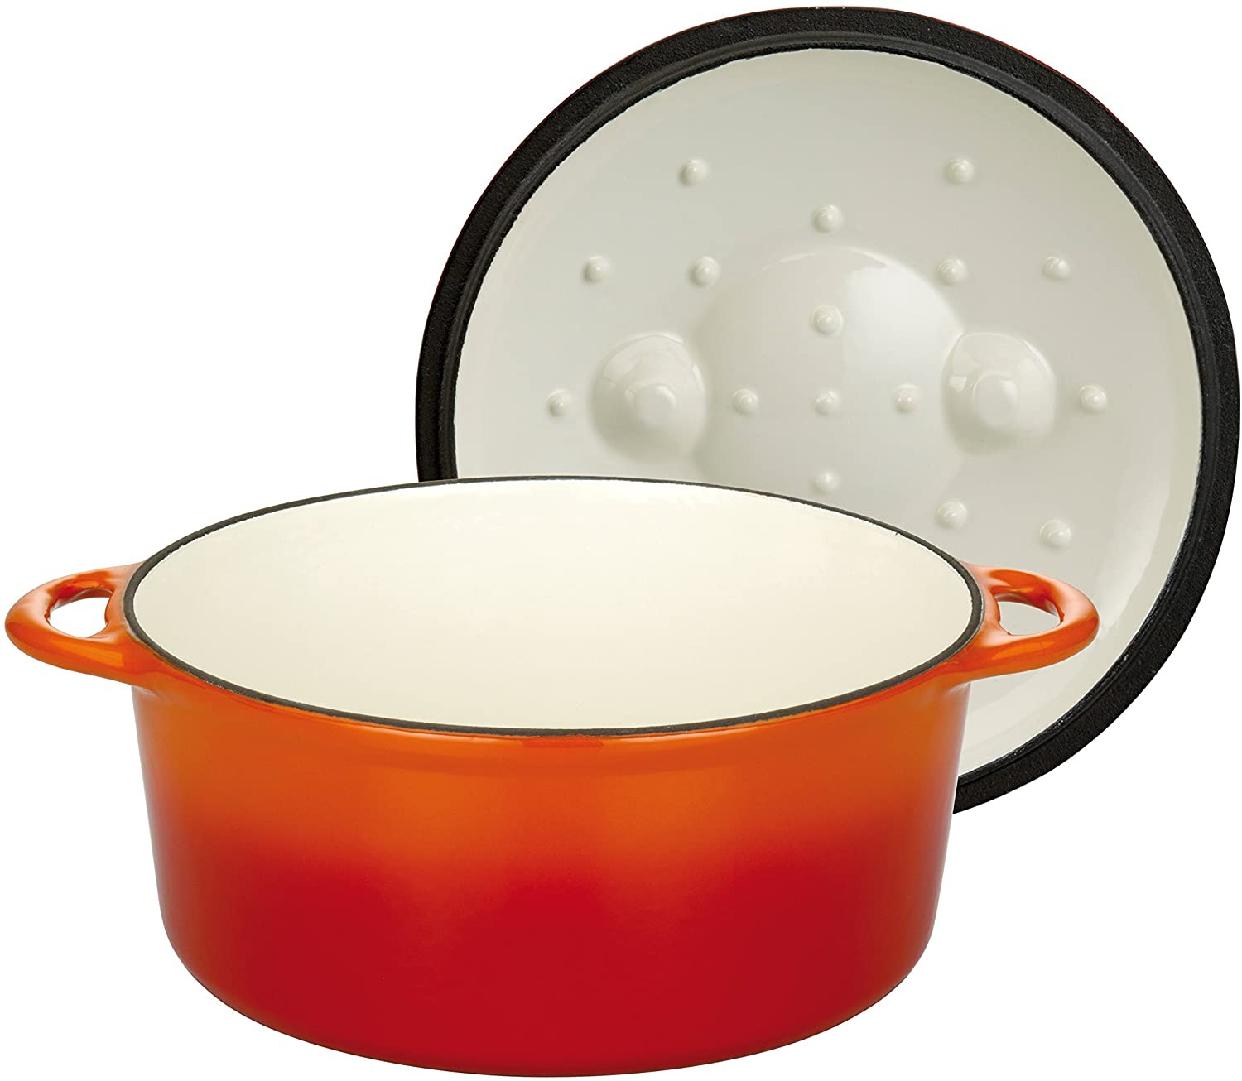 ruhru(ルール) Orange Shadow(オレンジシャドウ) 無水調理鍋 24cmx10cmの商品画像2